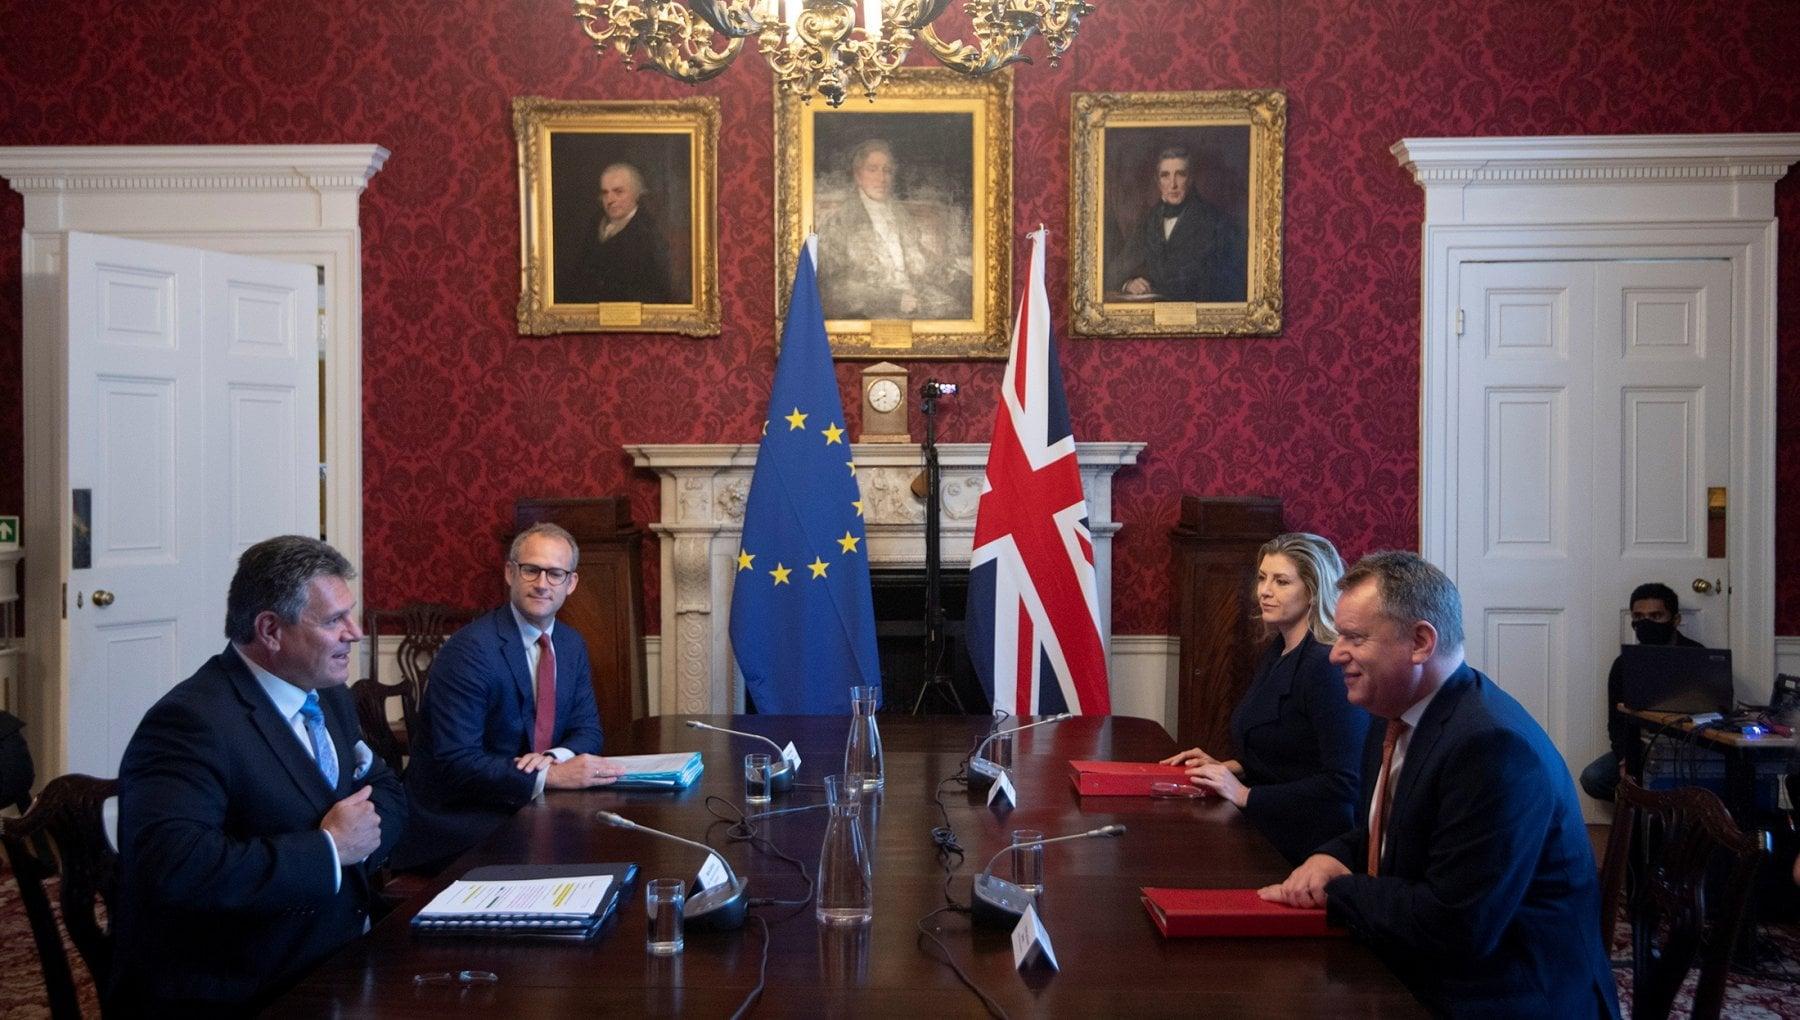 191324961 6858dd1e 113a 4290 a5ec 92cf6c2defe8 - Brexit, tra Londra e Bruxelles scoppia la guerra delle salsicce